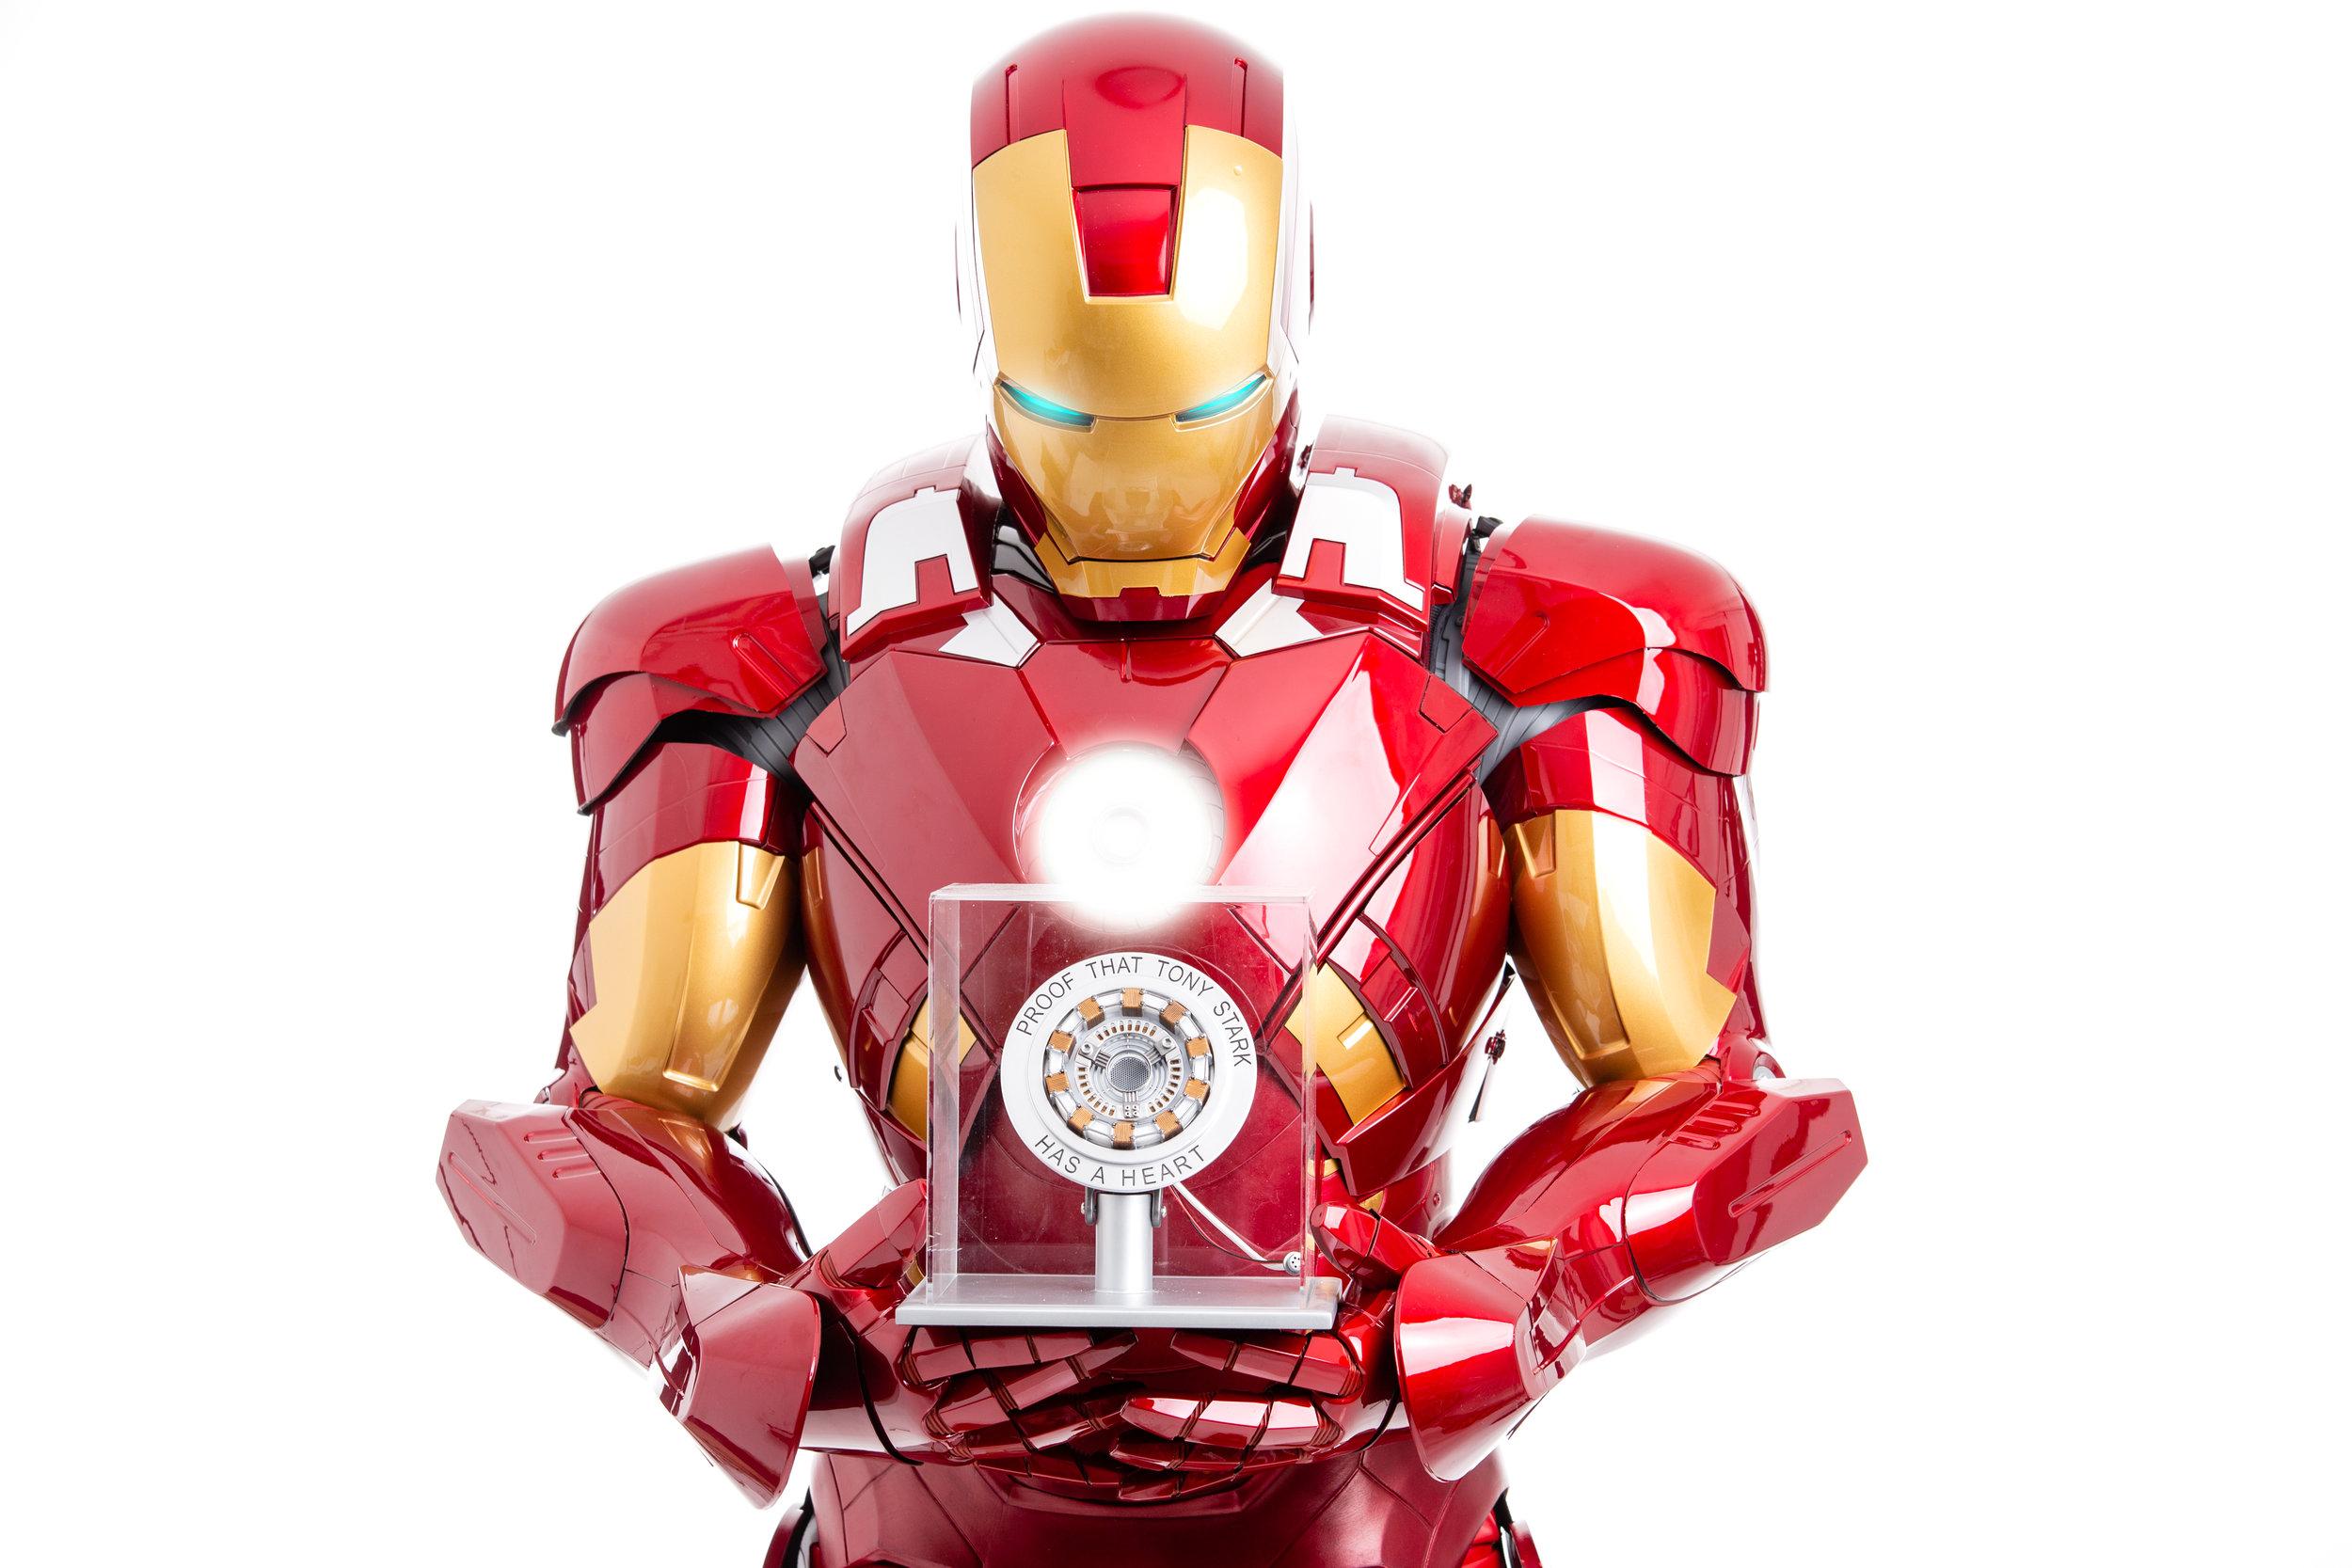 Paul McDowell is Iron Man at ELM Photo Studio